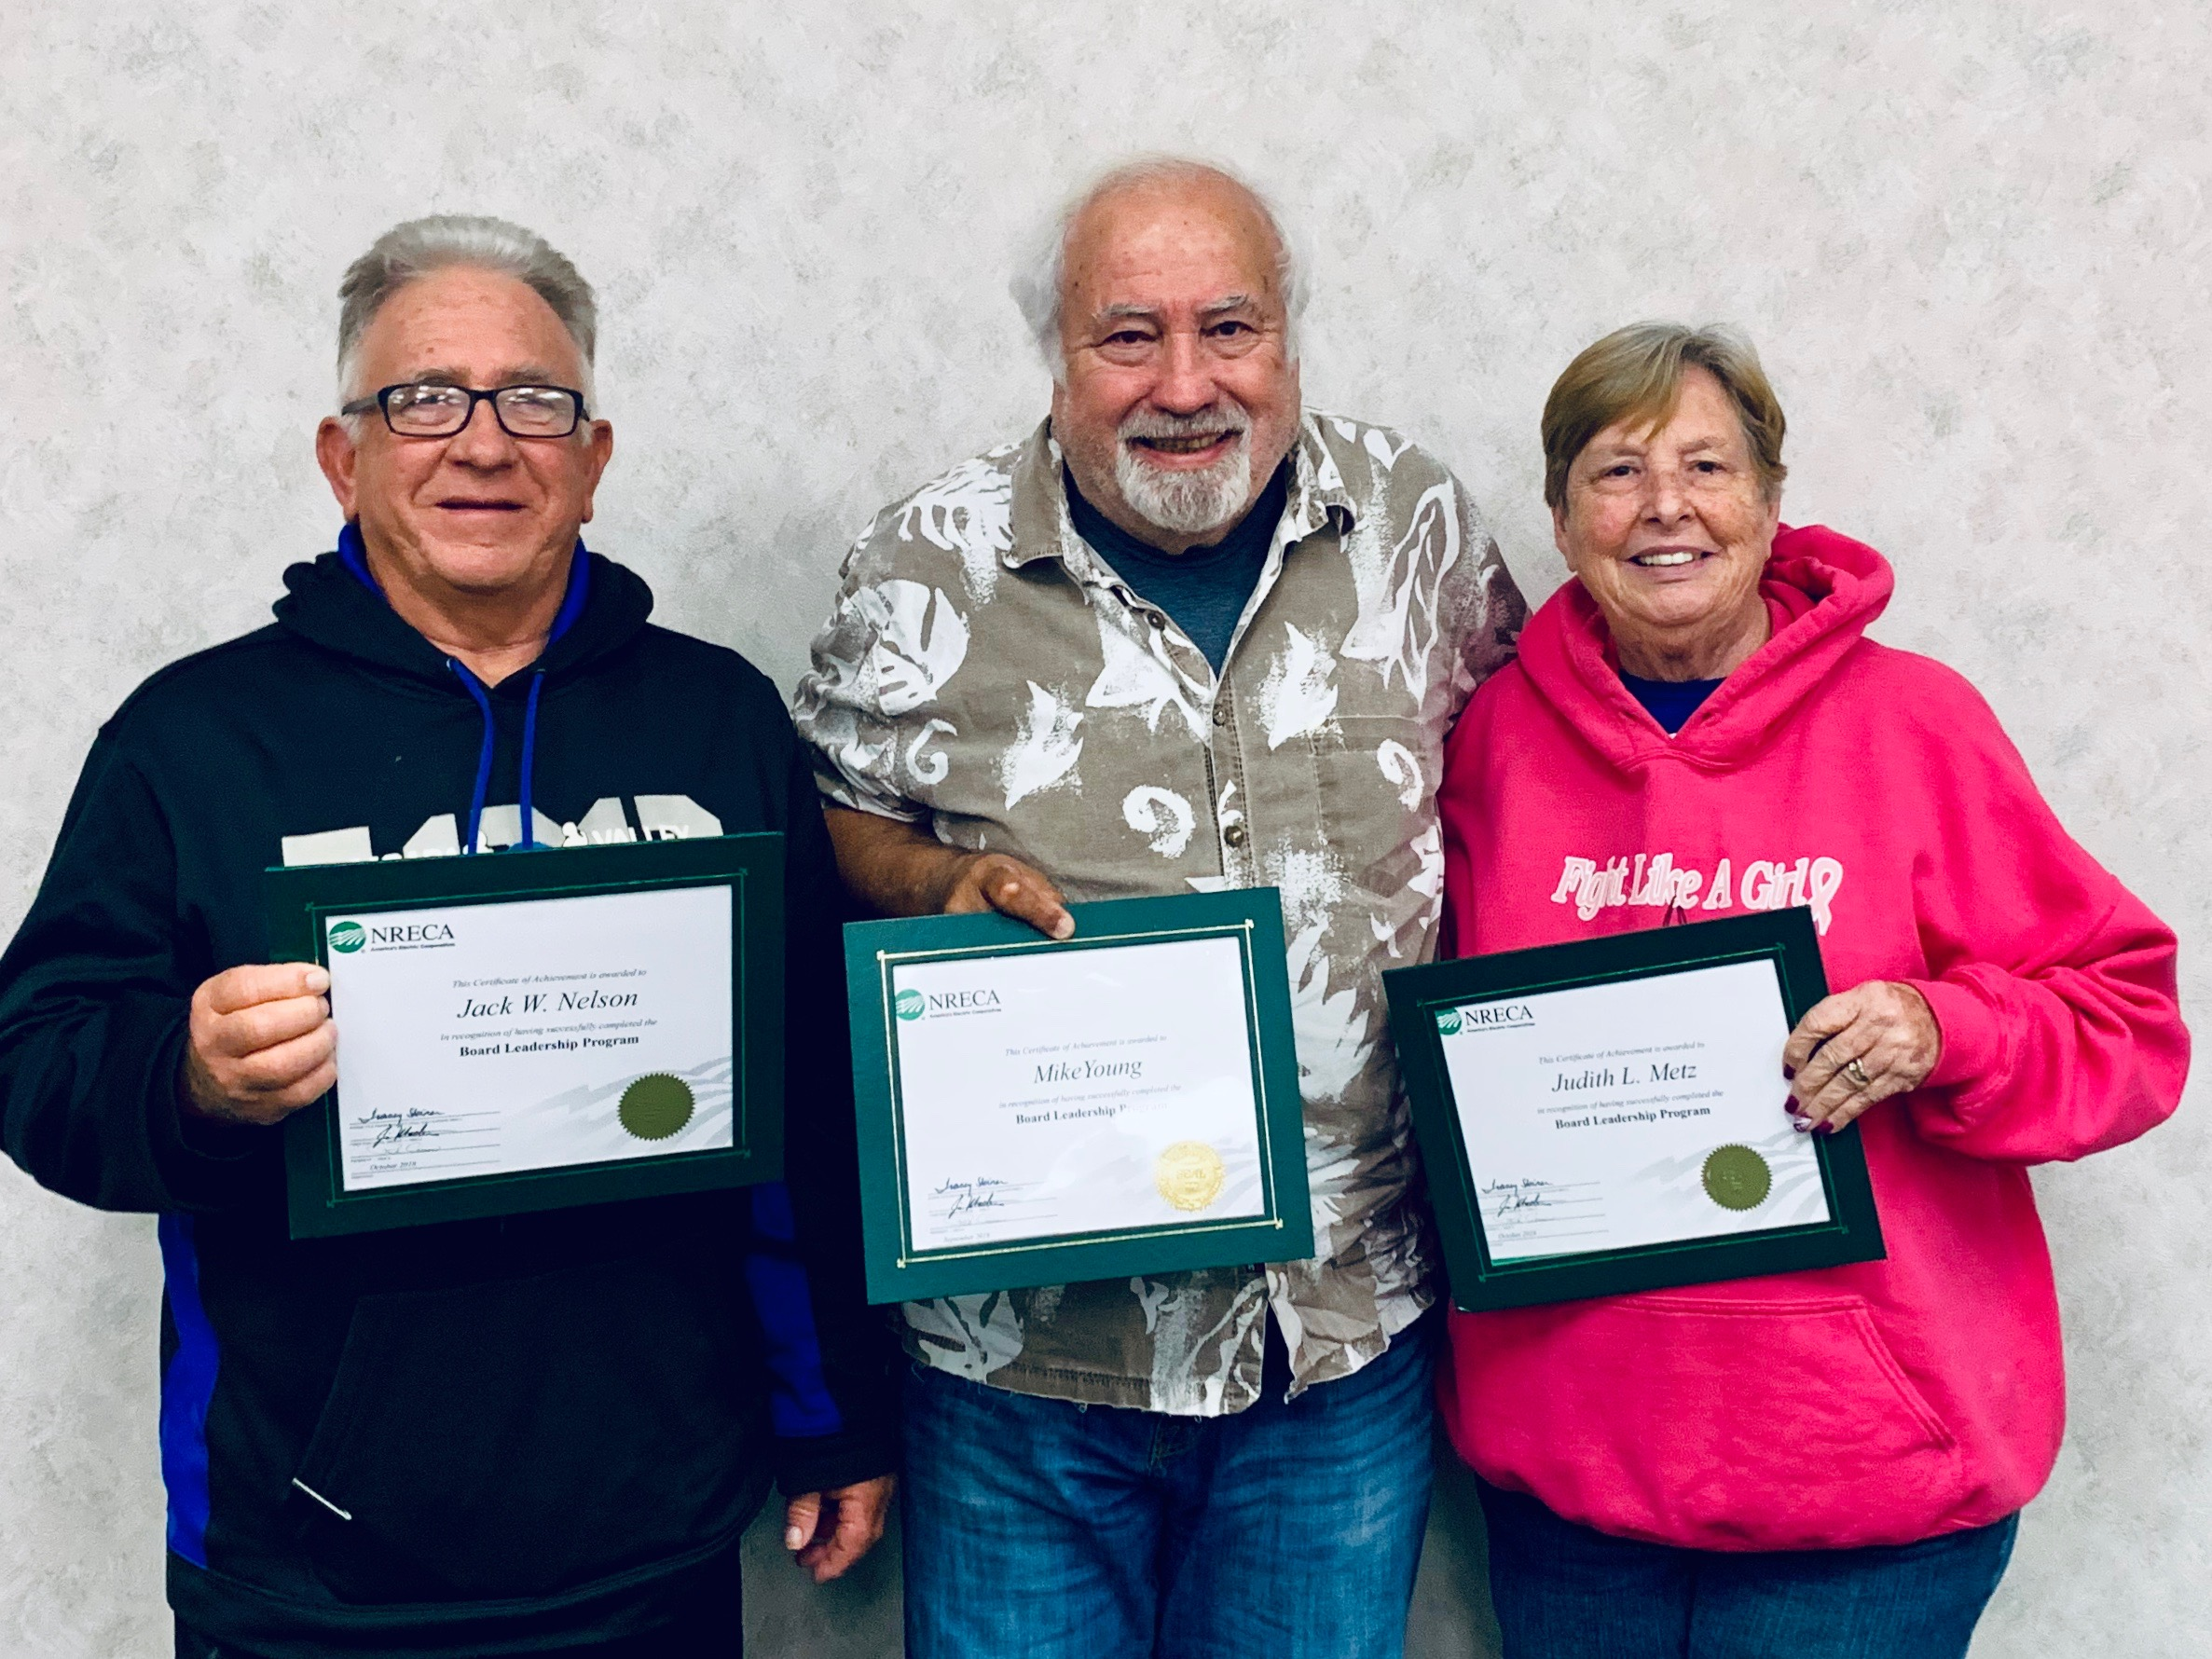 Board members received NRECA Board Leadership Certifications